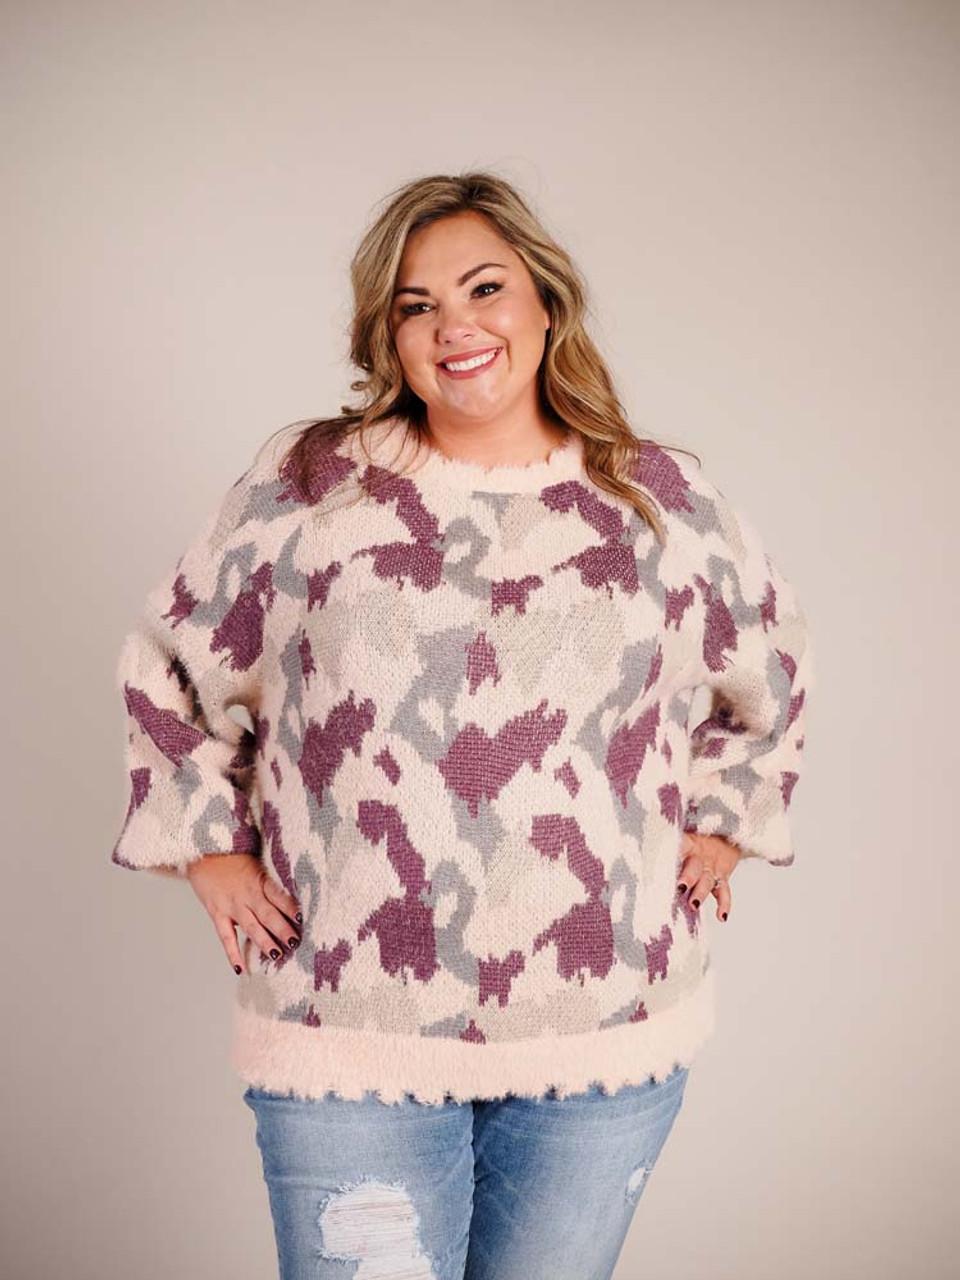 pink grey purple camouflage fuzzy sweater umgee plus clothing curvy